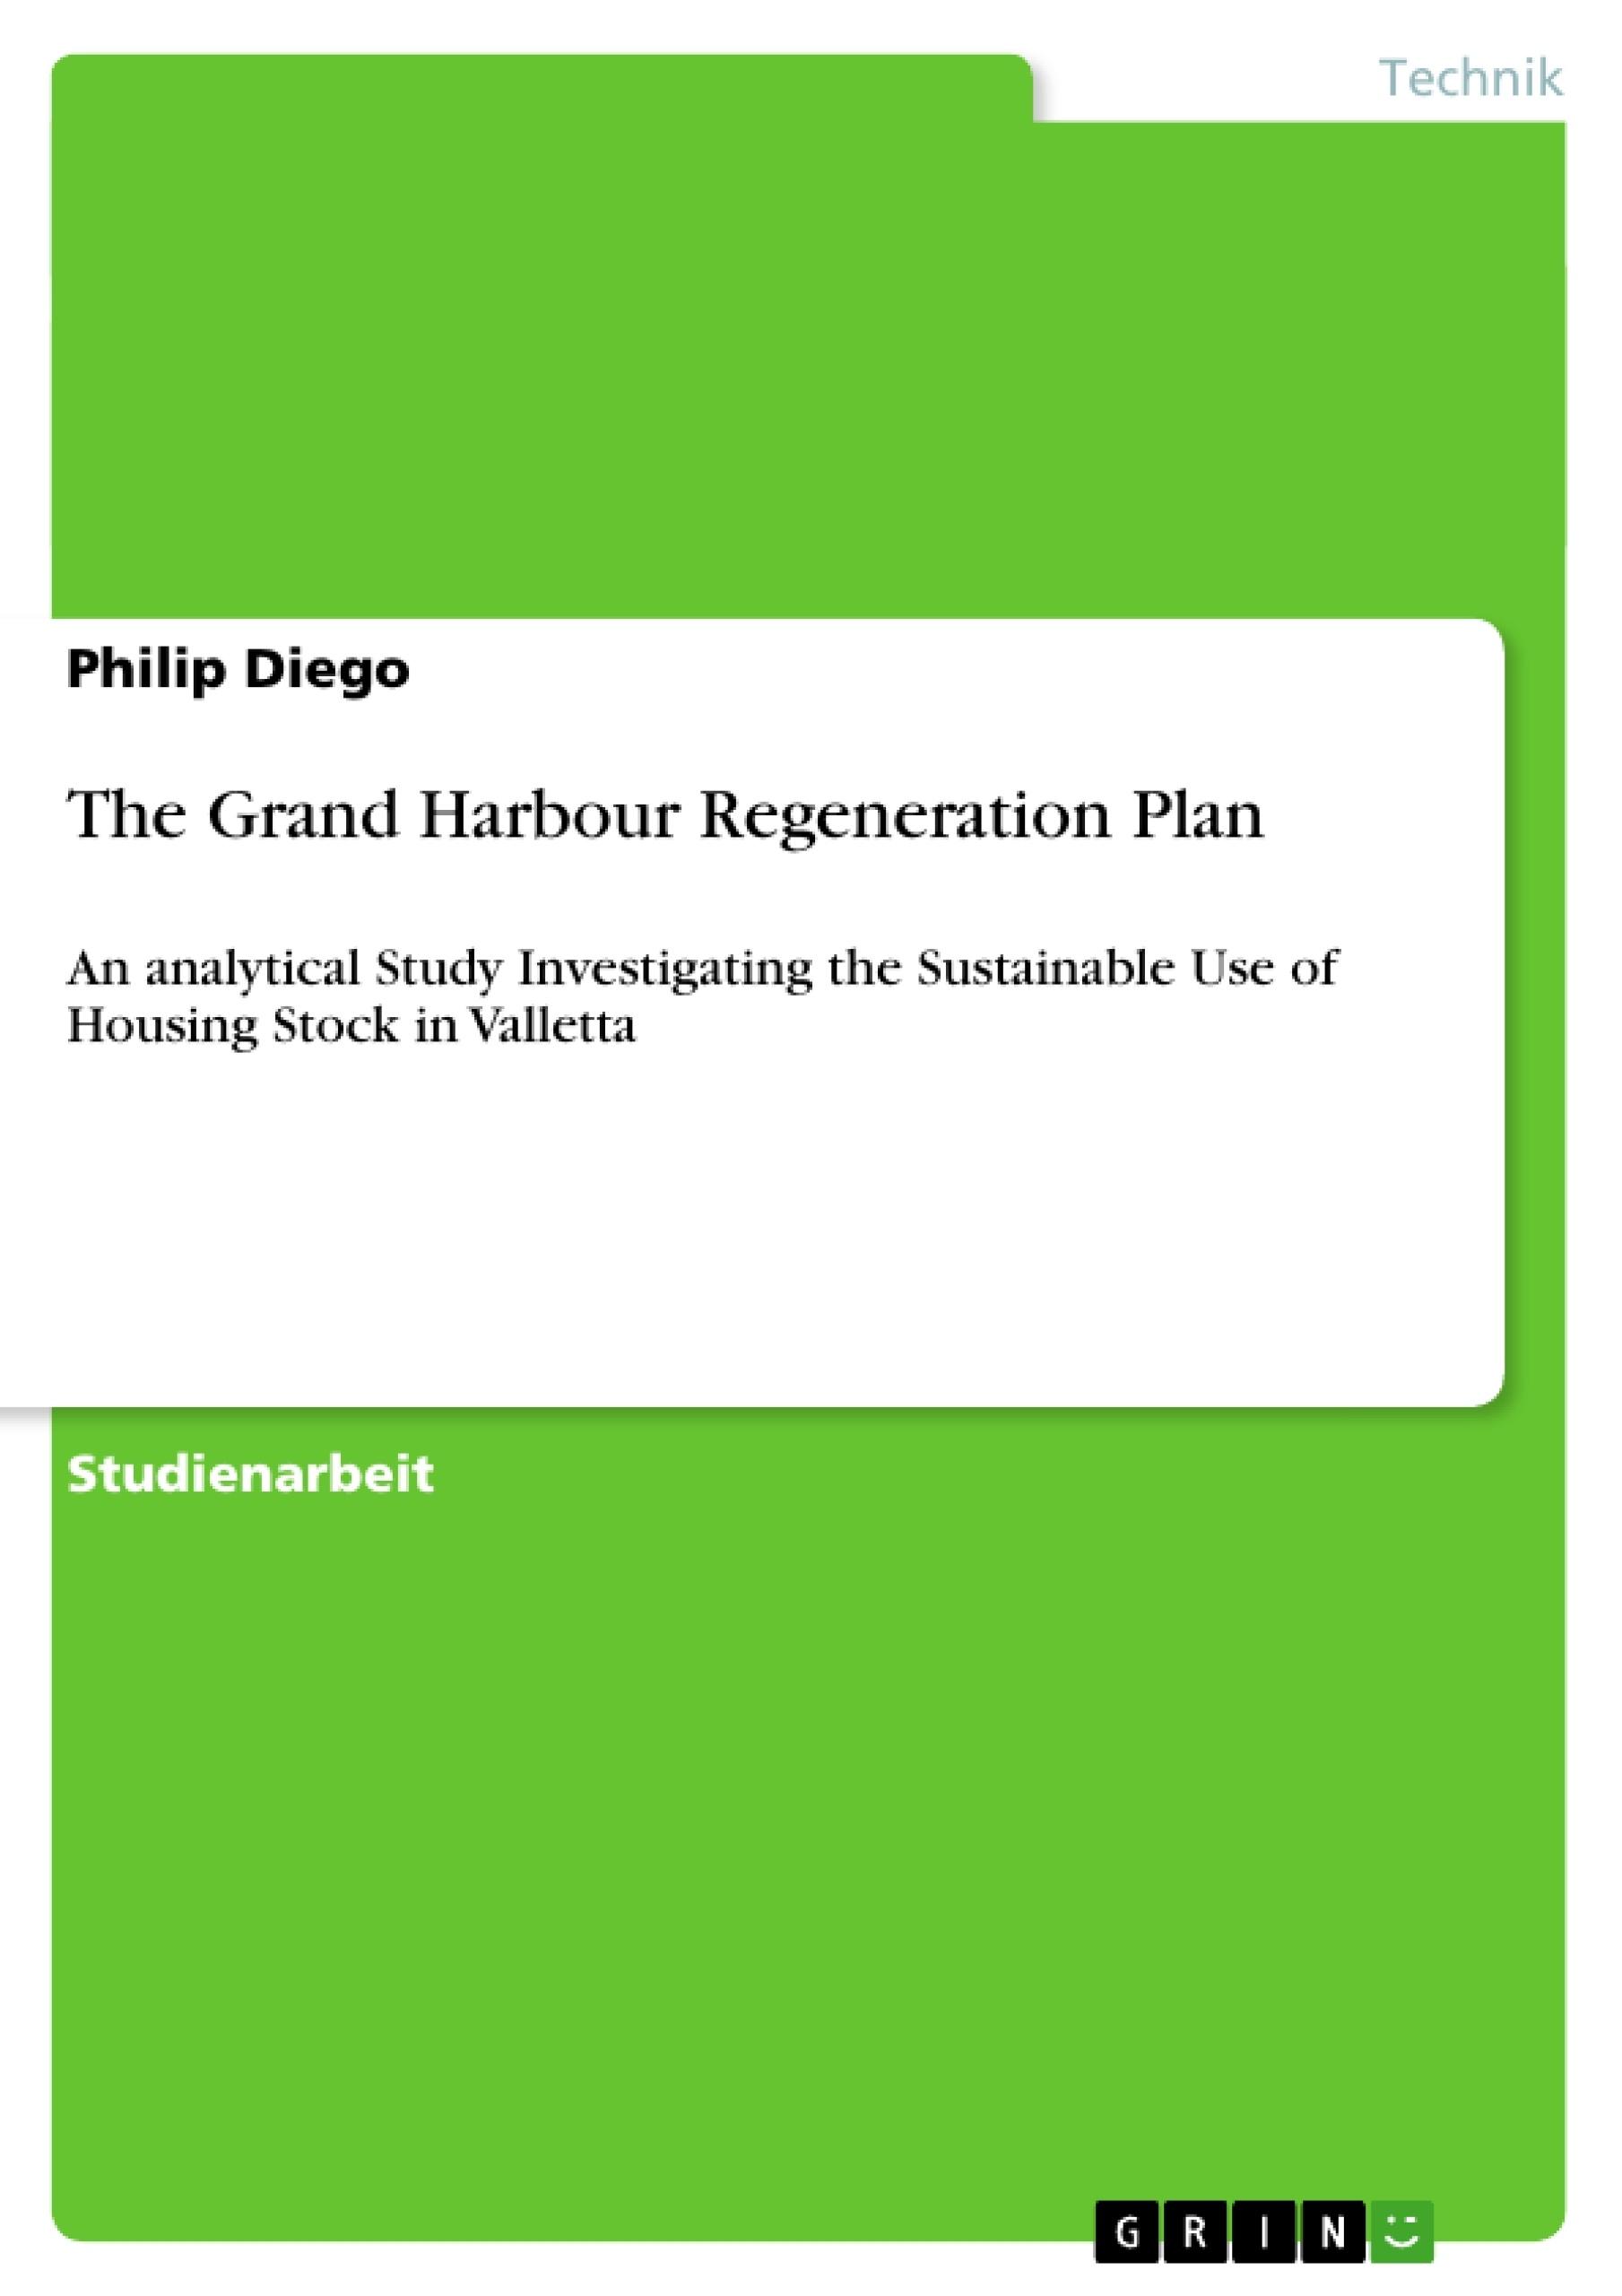 Titel: The Grand Harbour Regeneration Plan